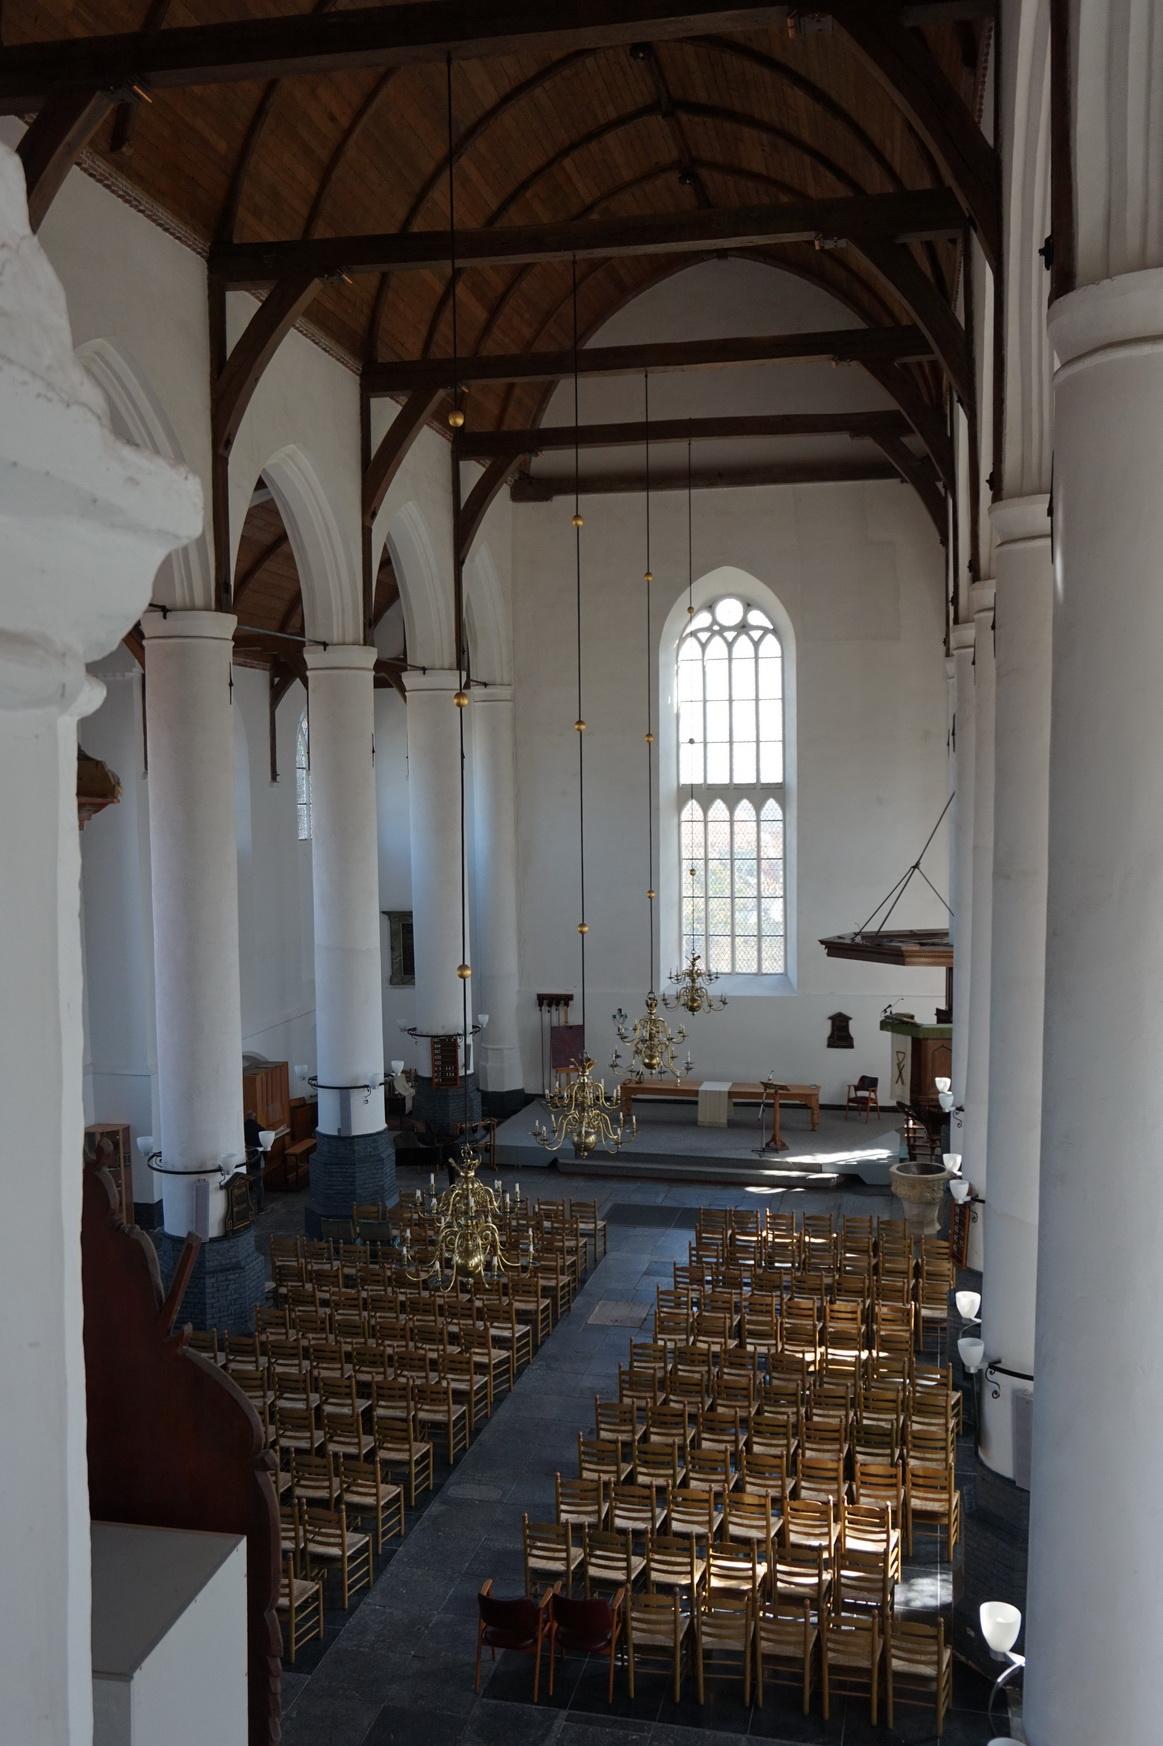 Texel - Den Burgh Kirche 4